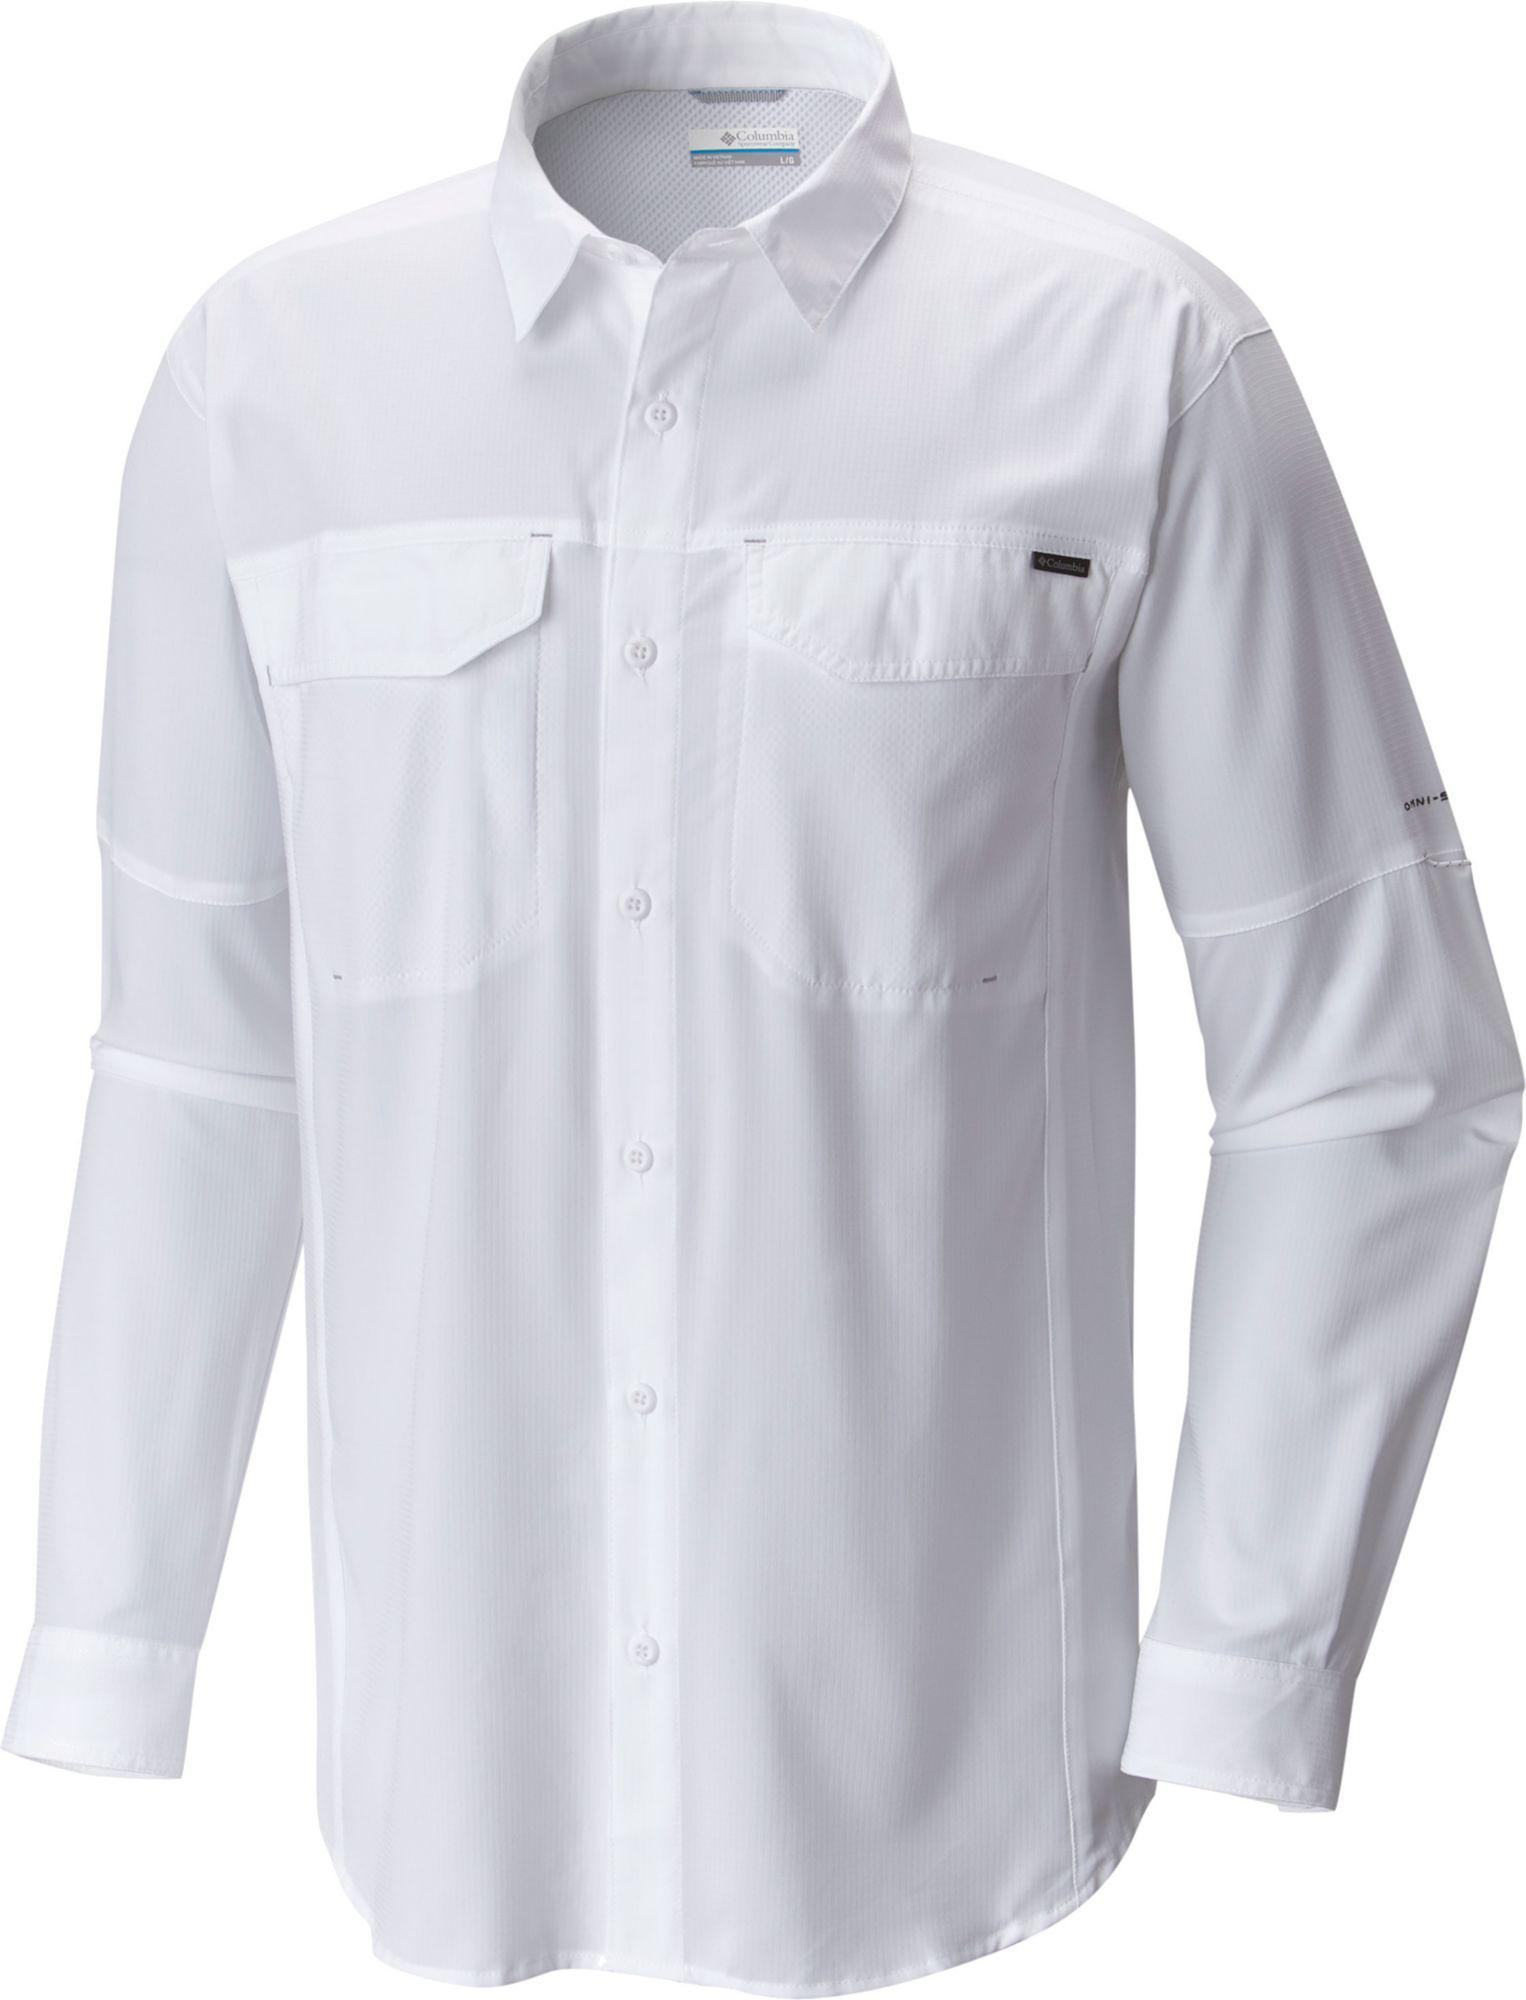 e8ae1fce58c1f8 https://www.lyst.com/clothing/columbia-outdoor-elements-ii-t-shirt-4 ...